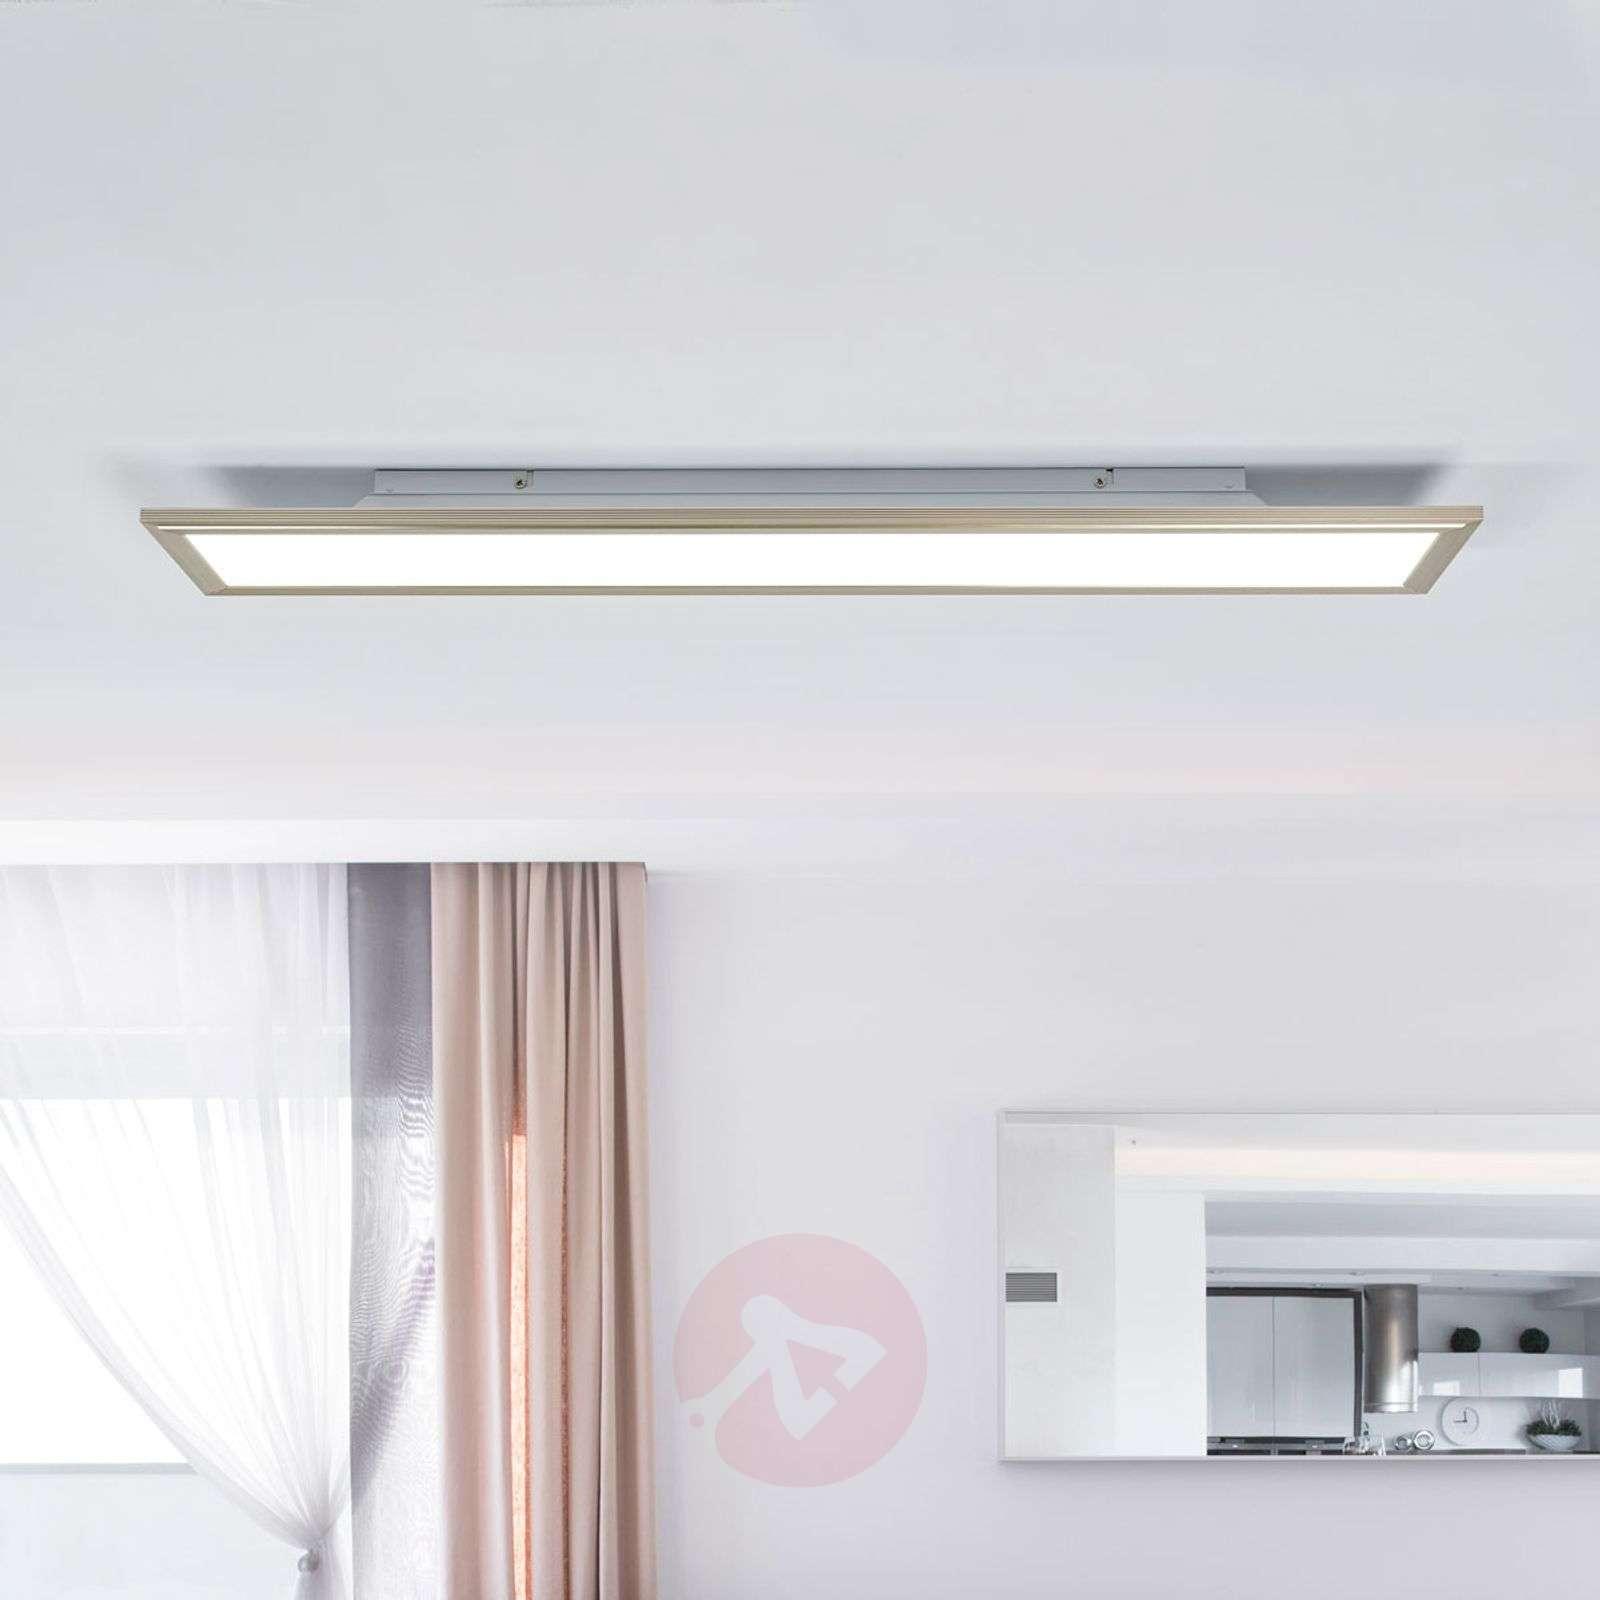 Corinna LED ceiling light 2700 6200K, 90 x 15 cm-1558116-03